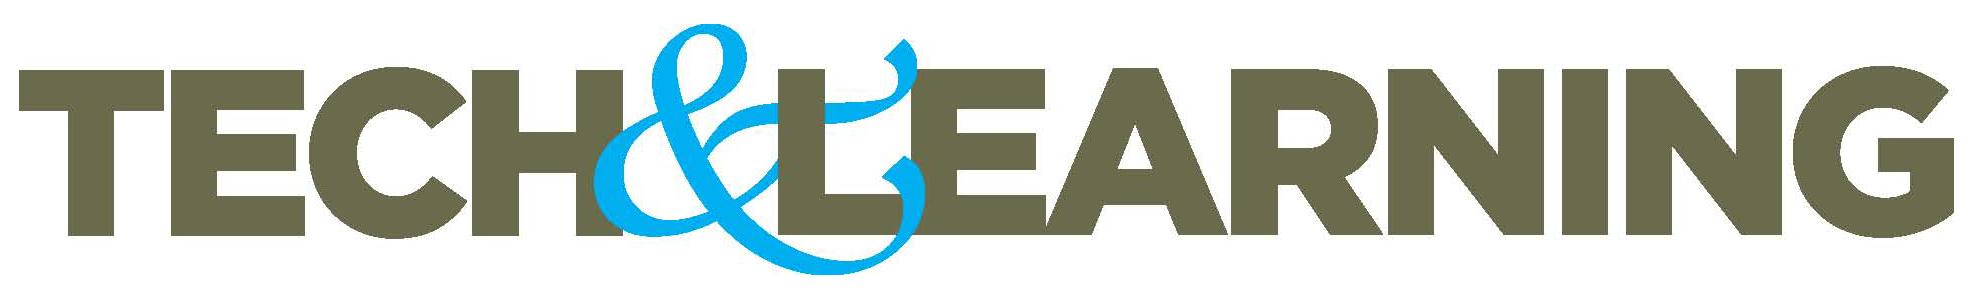 tech-and-learning_logo.jpg